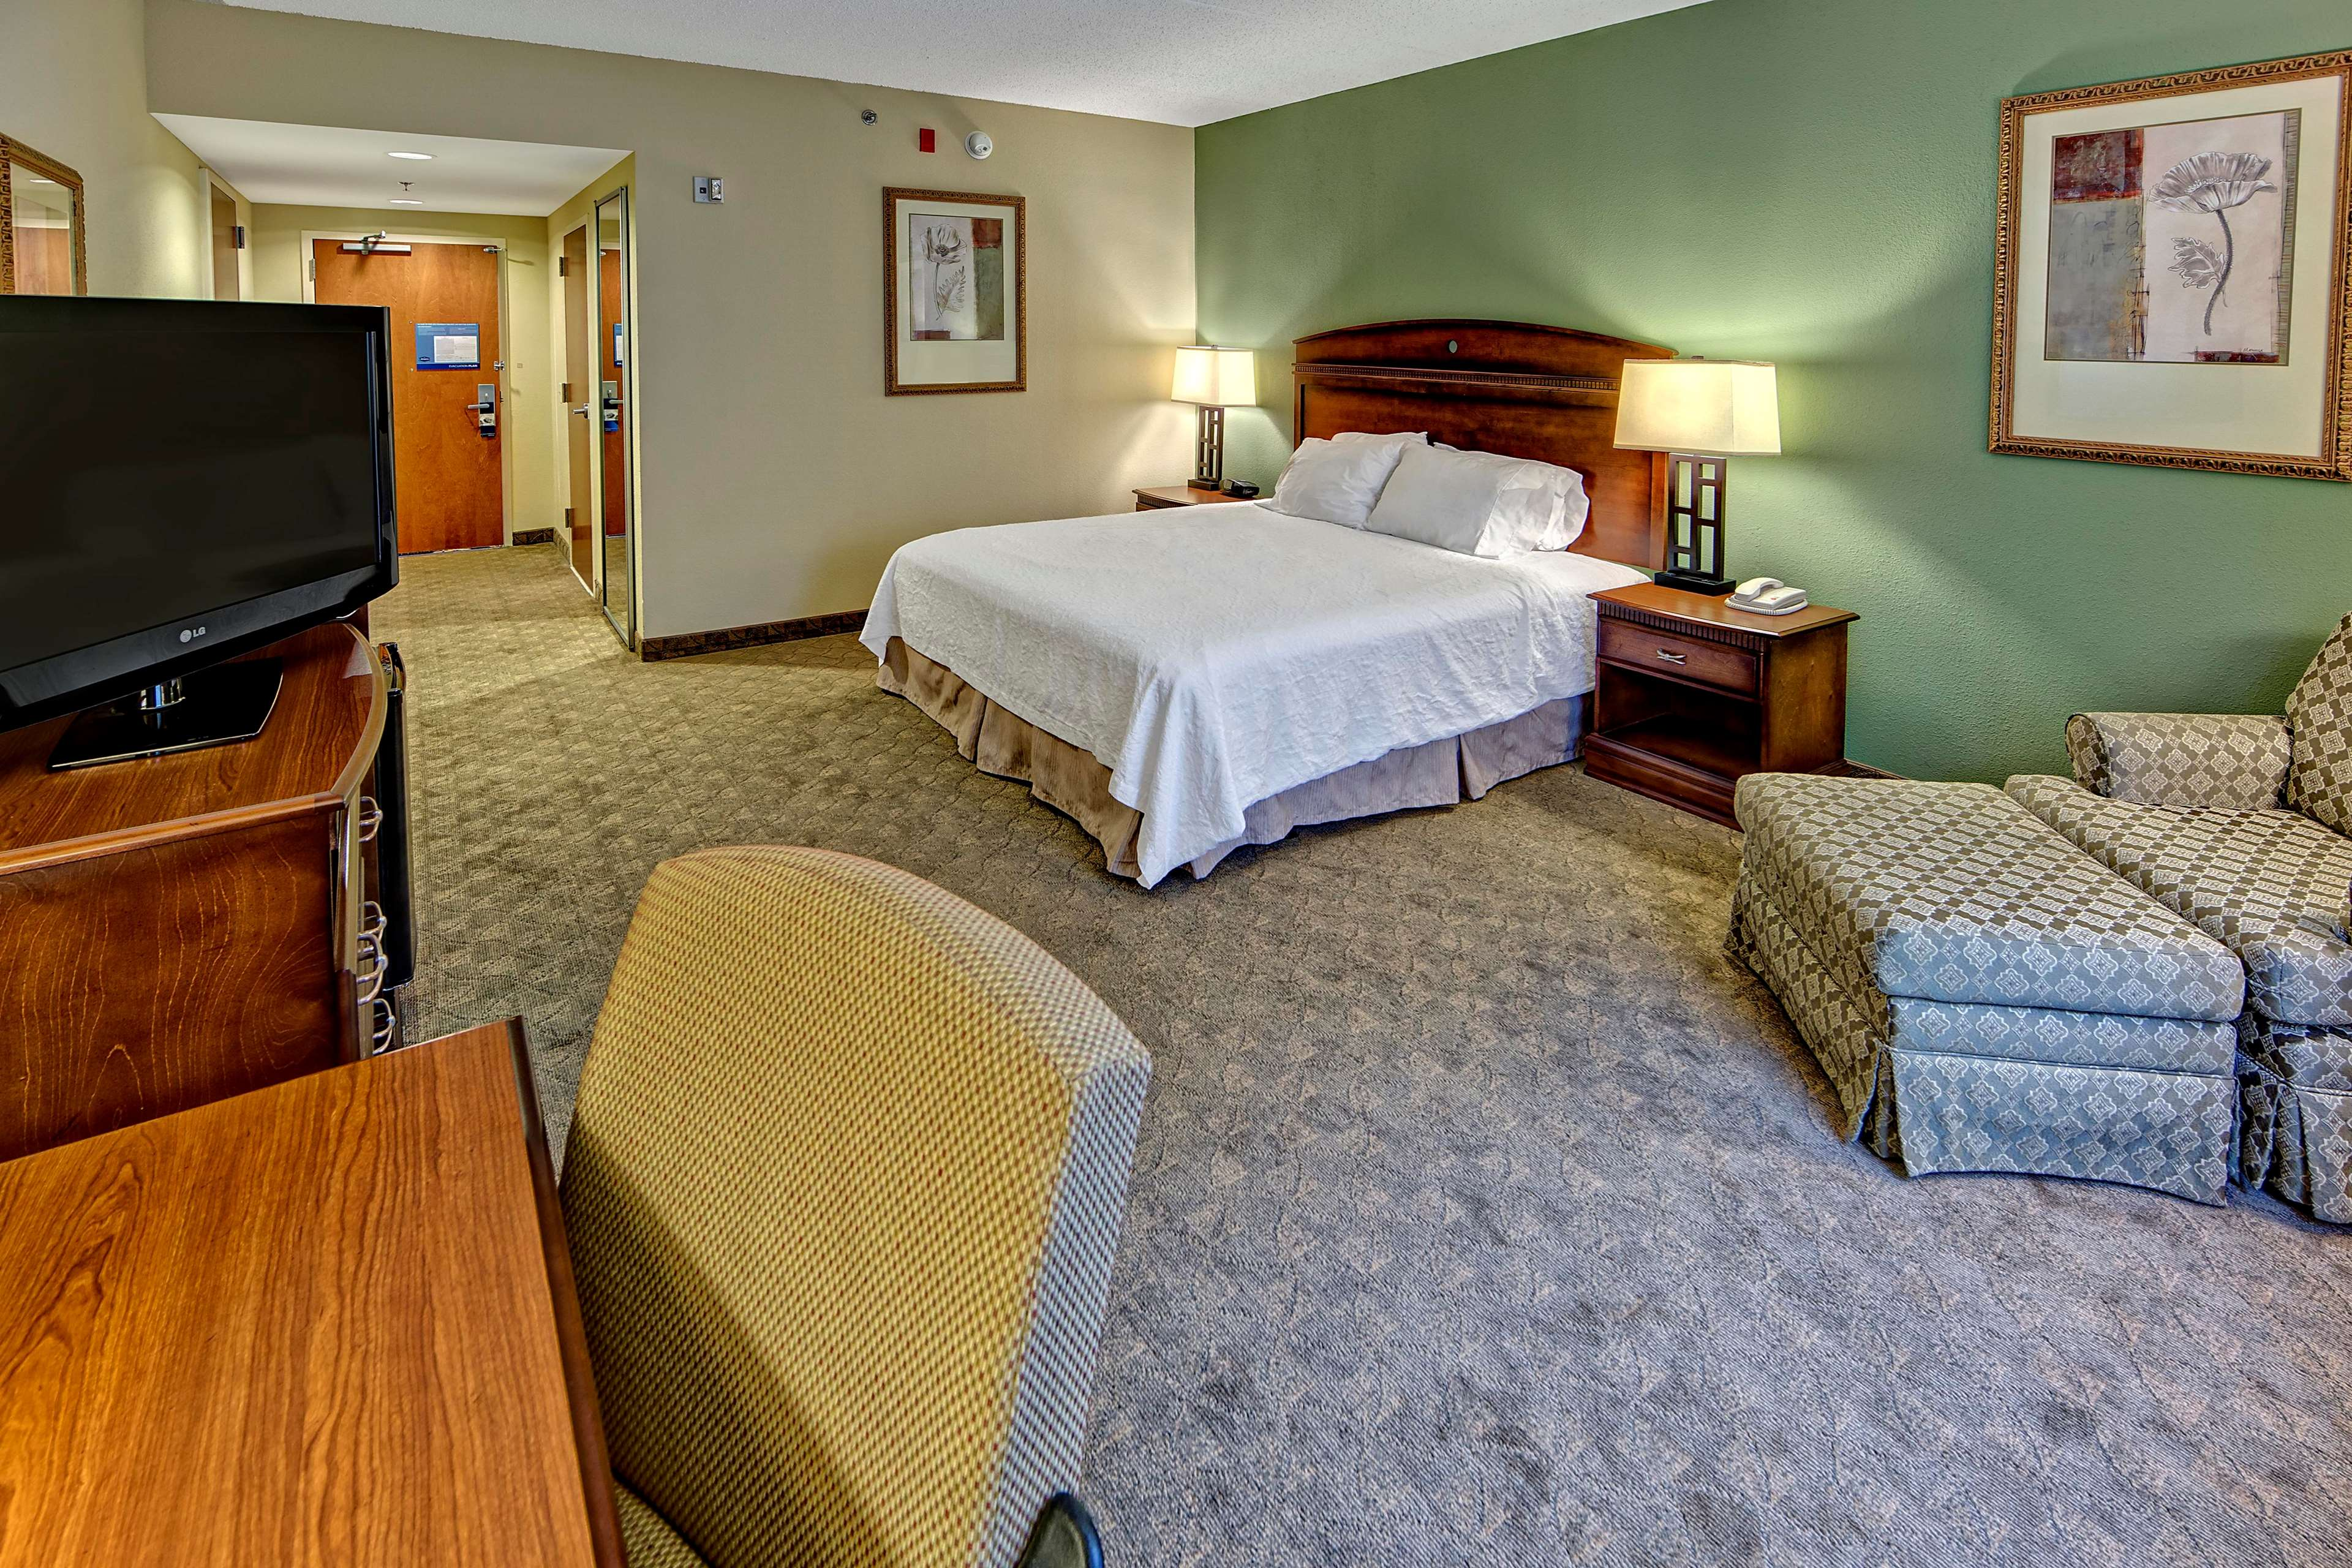 Hampton Inn & Suites Cashiers-Sapphire Valley image 39